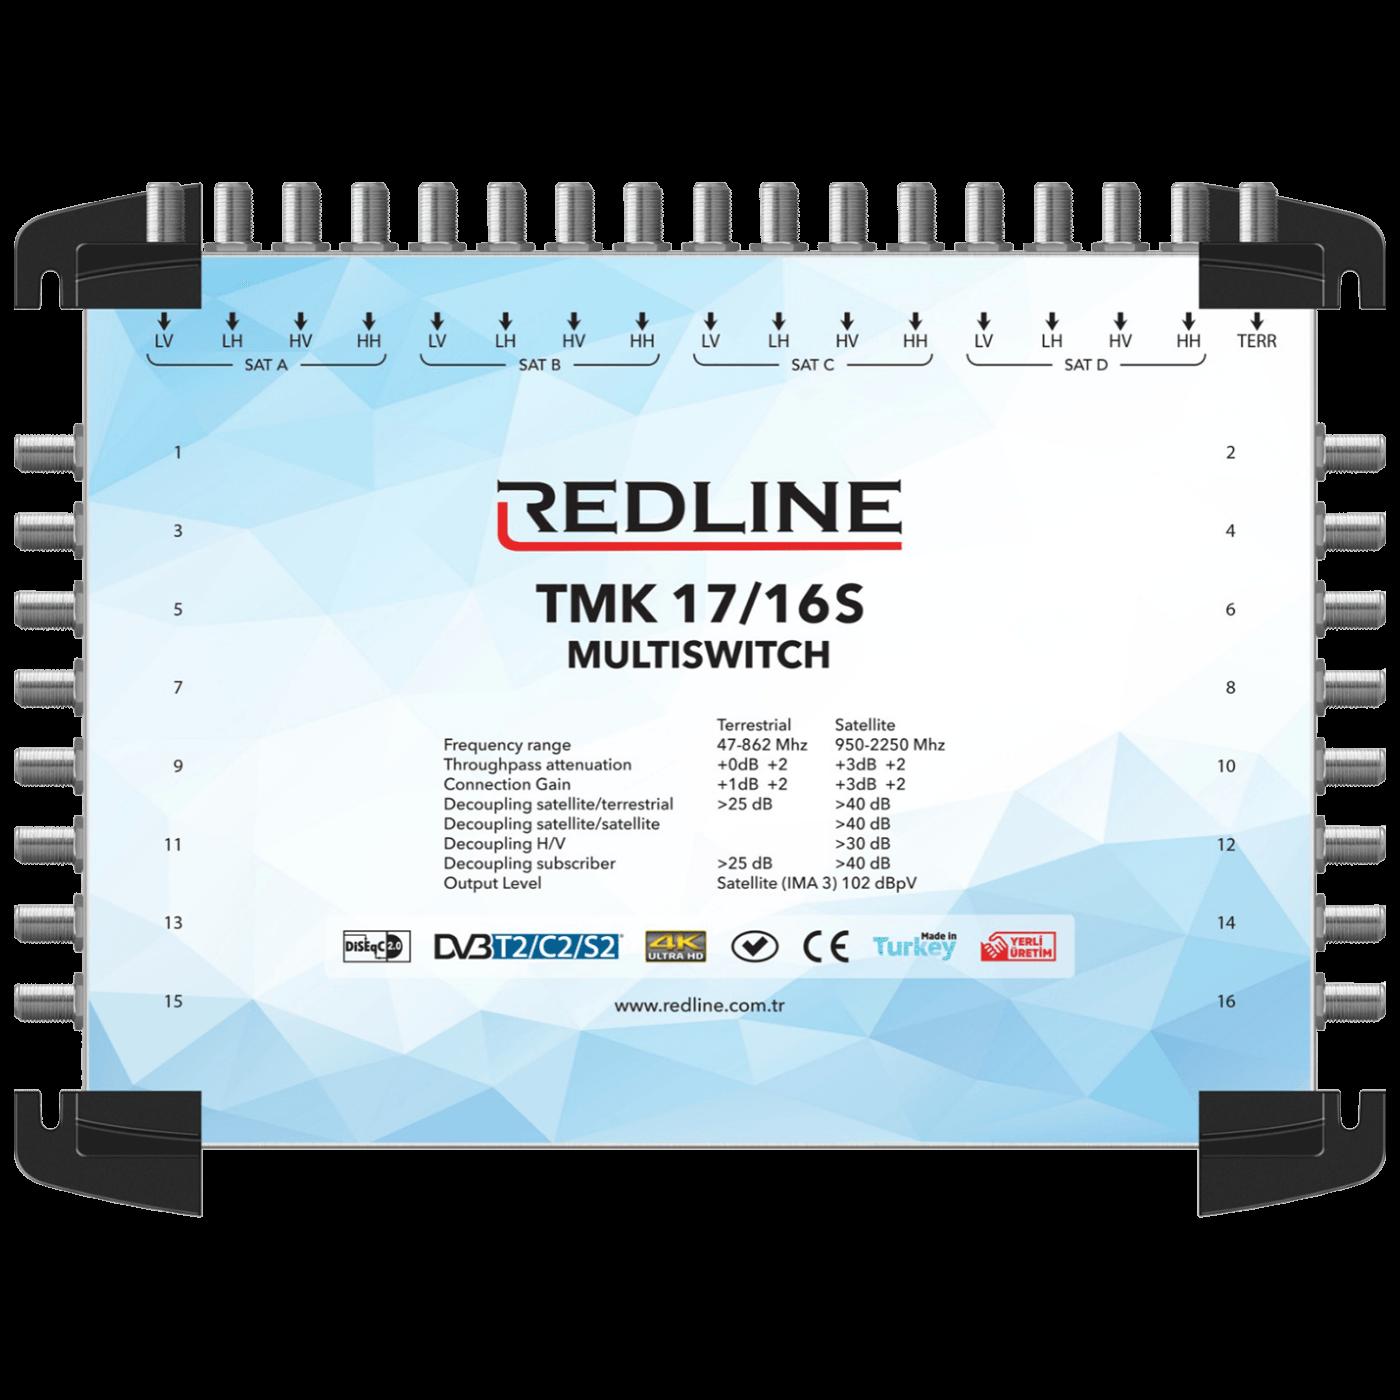 REDLINE - TMK 17/16S